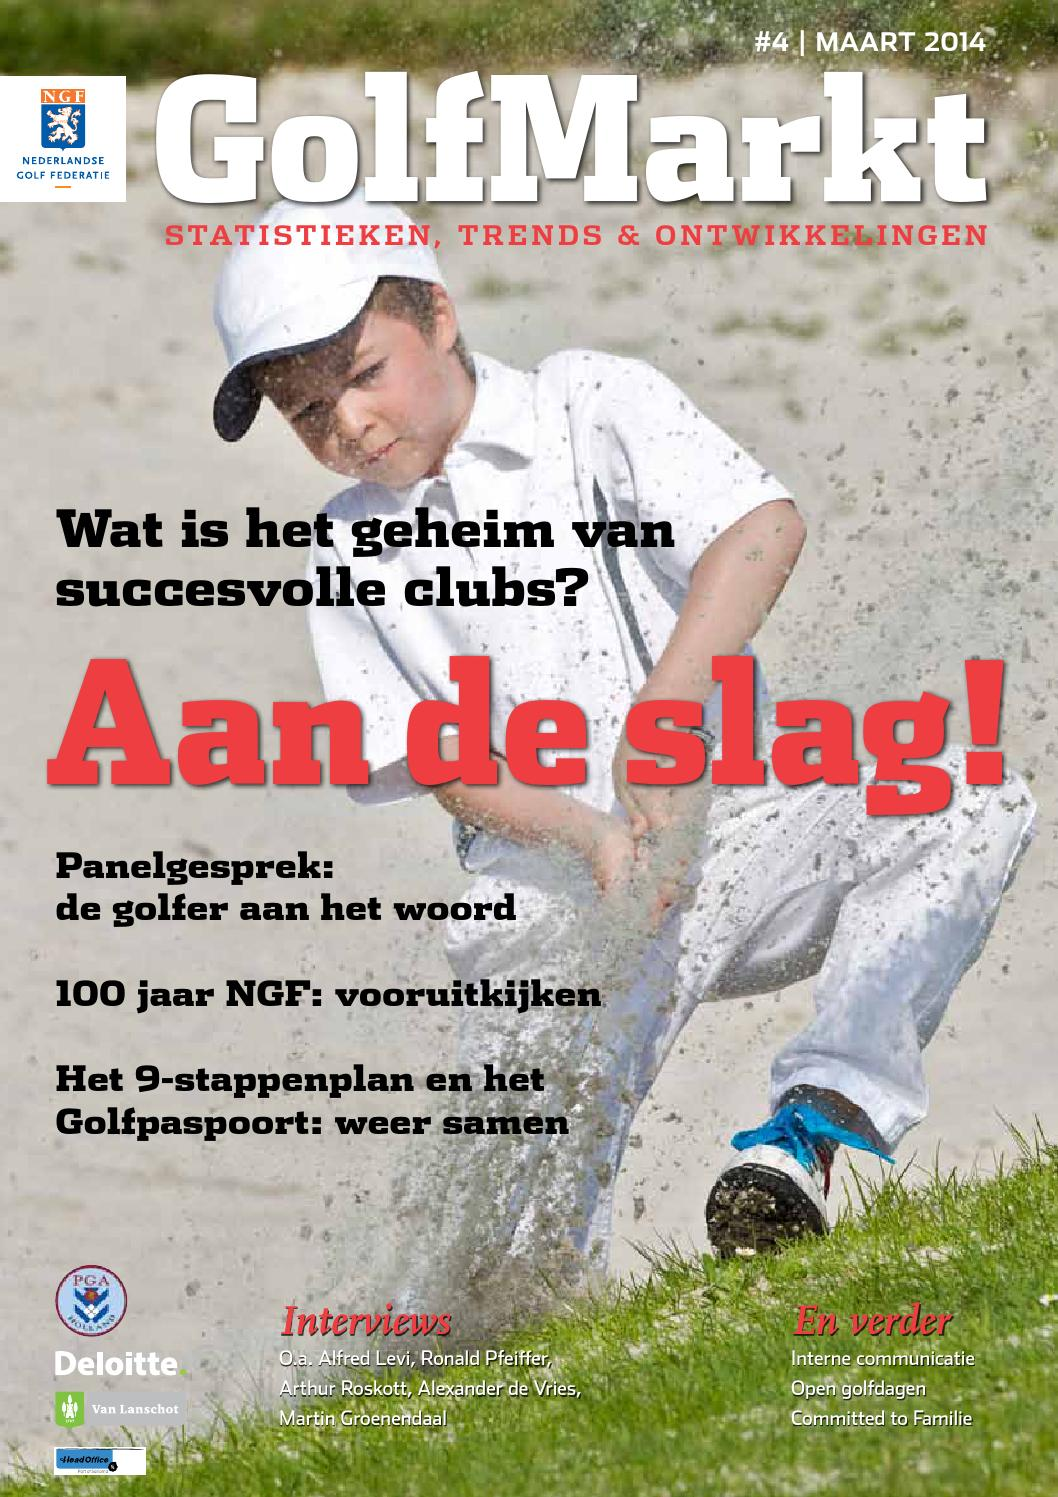 Ngf jaarverslag 2014 by koninklijke nederlandse golf federatie   issuu